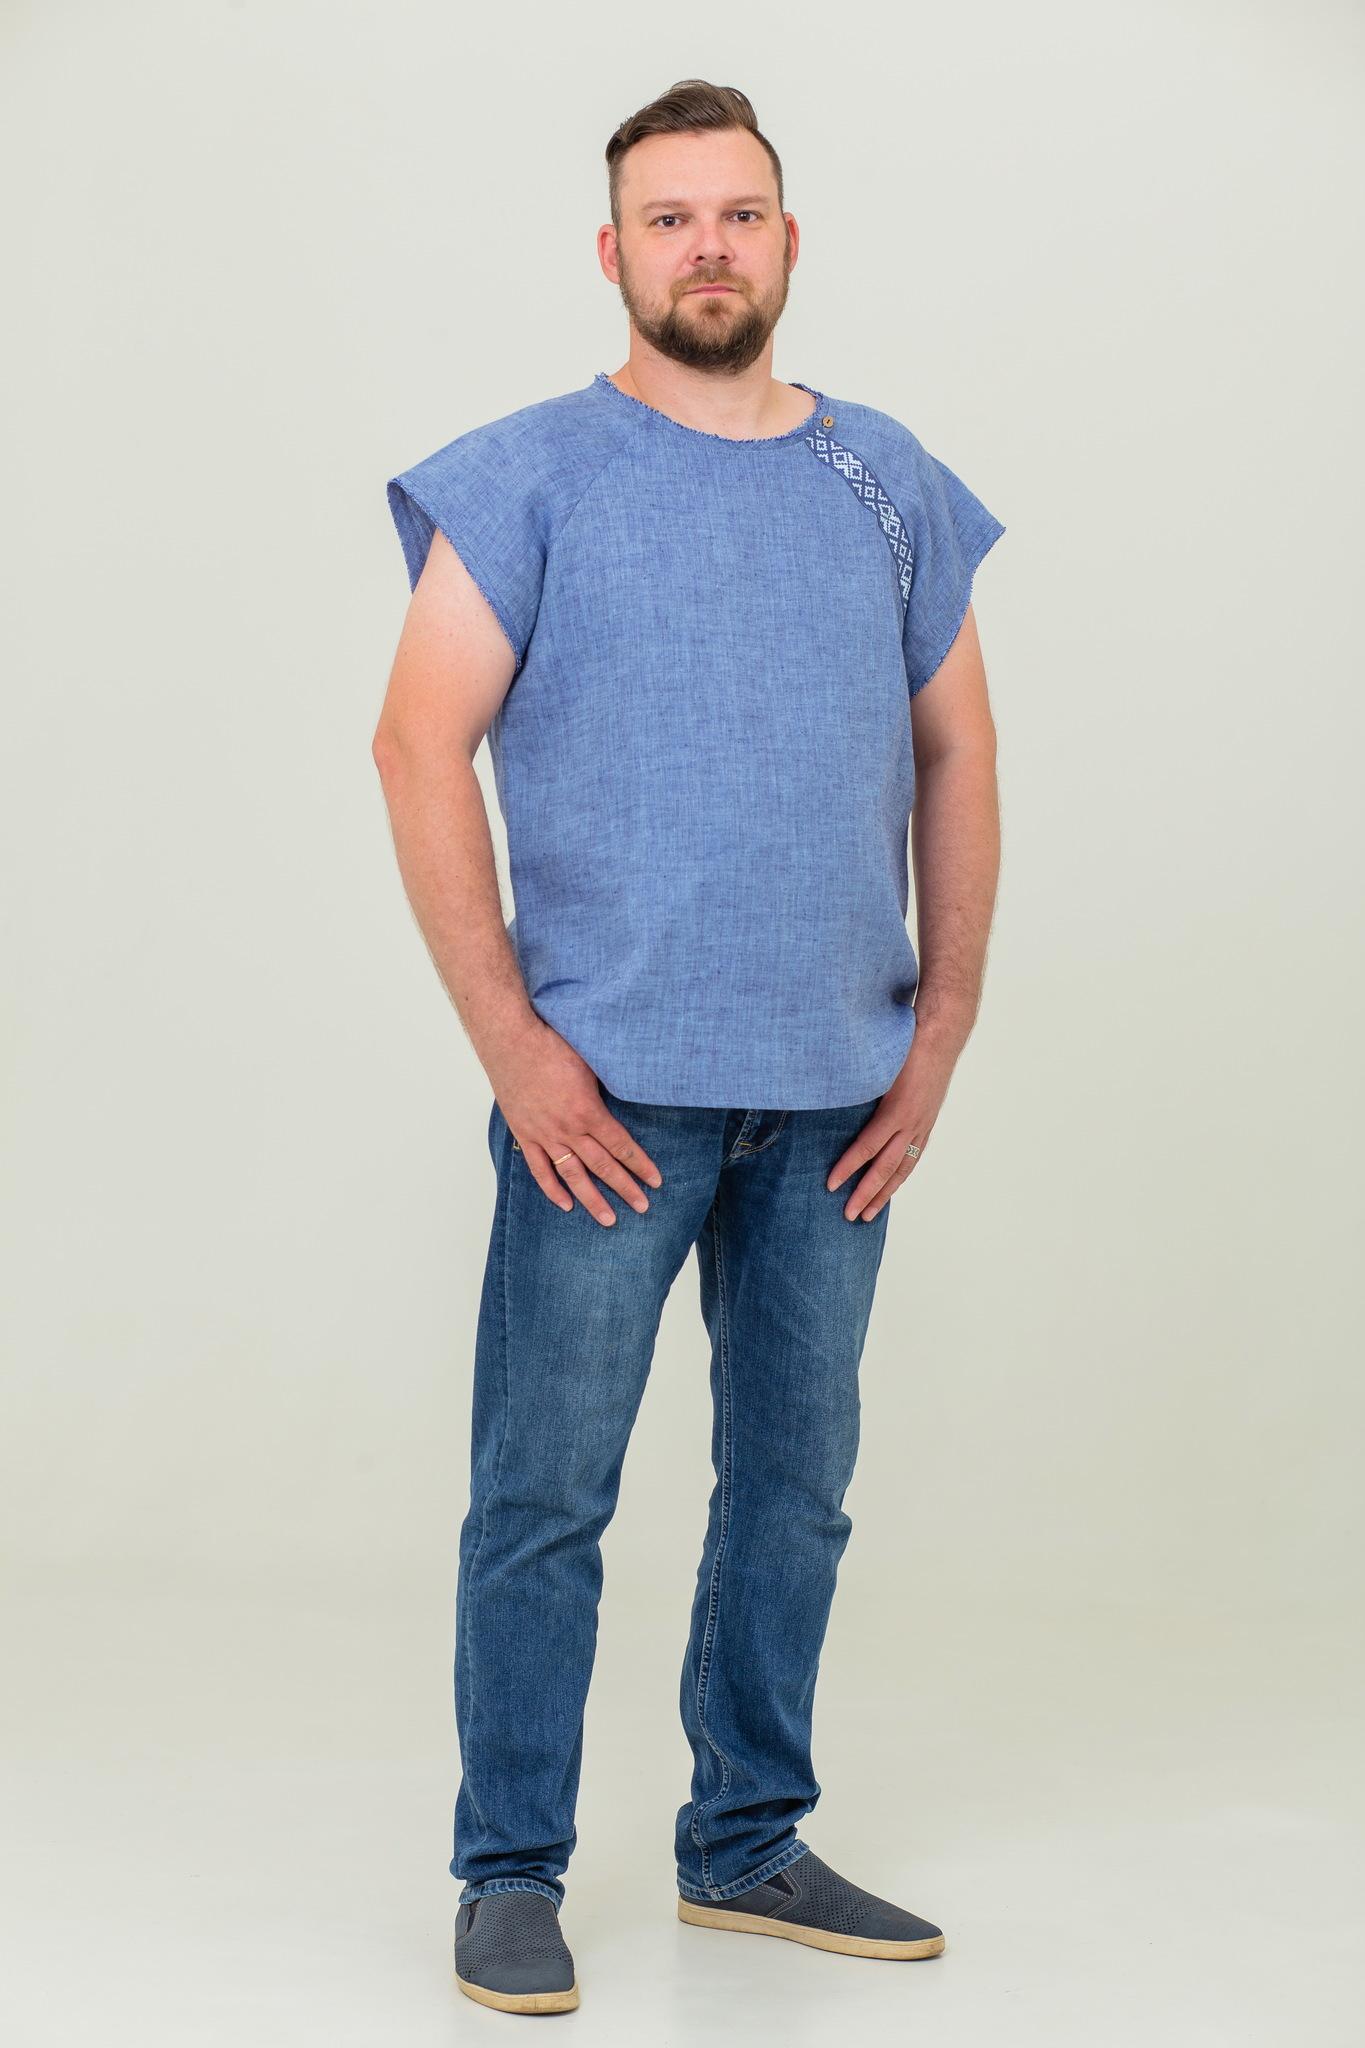 Летняя футболка из льна для мужчин Богатырская